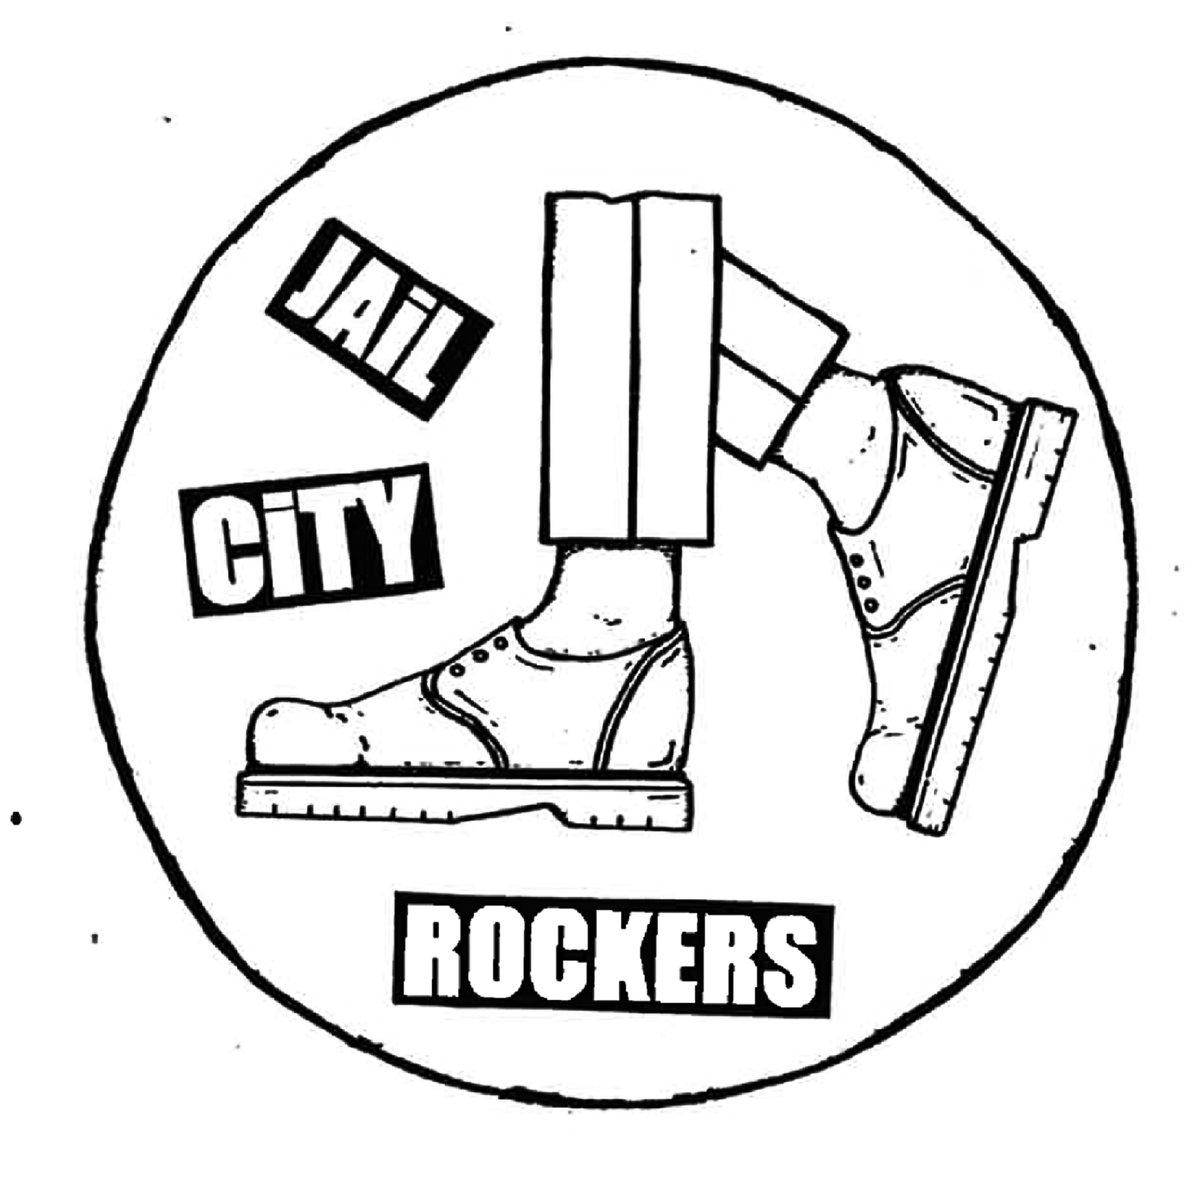 1200x1200 Music Jail City Rockers